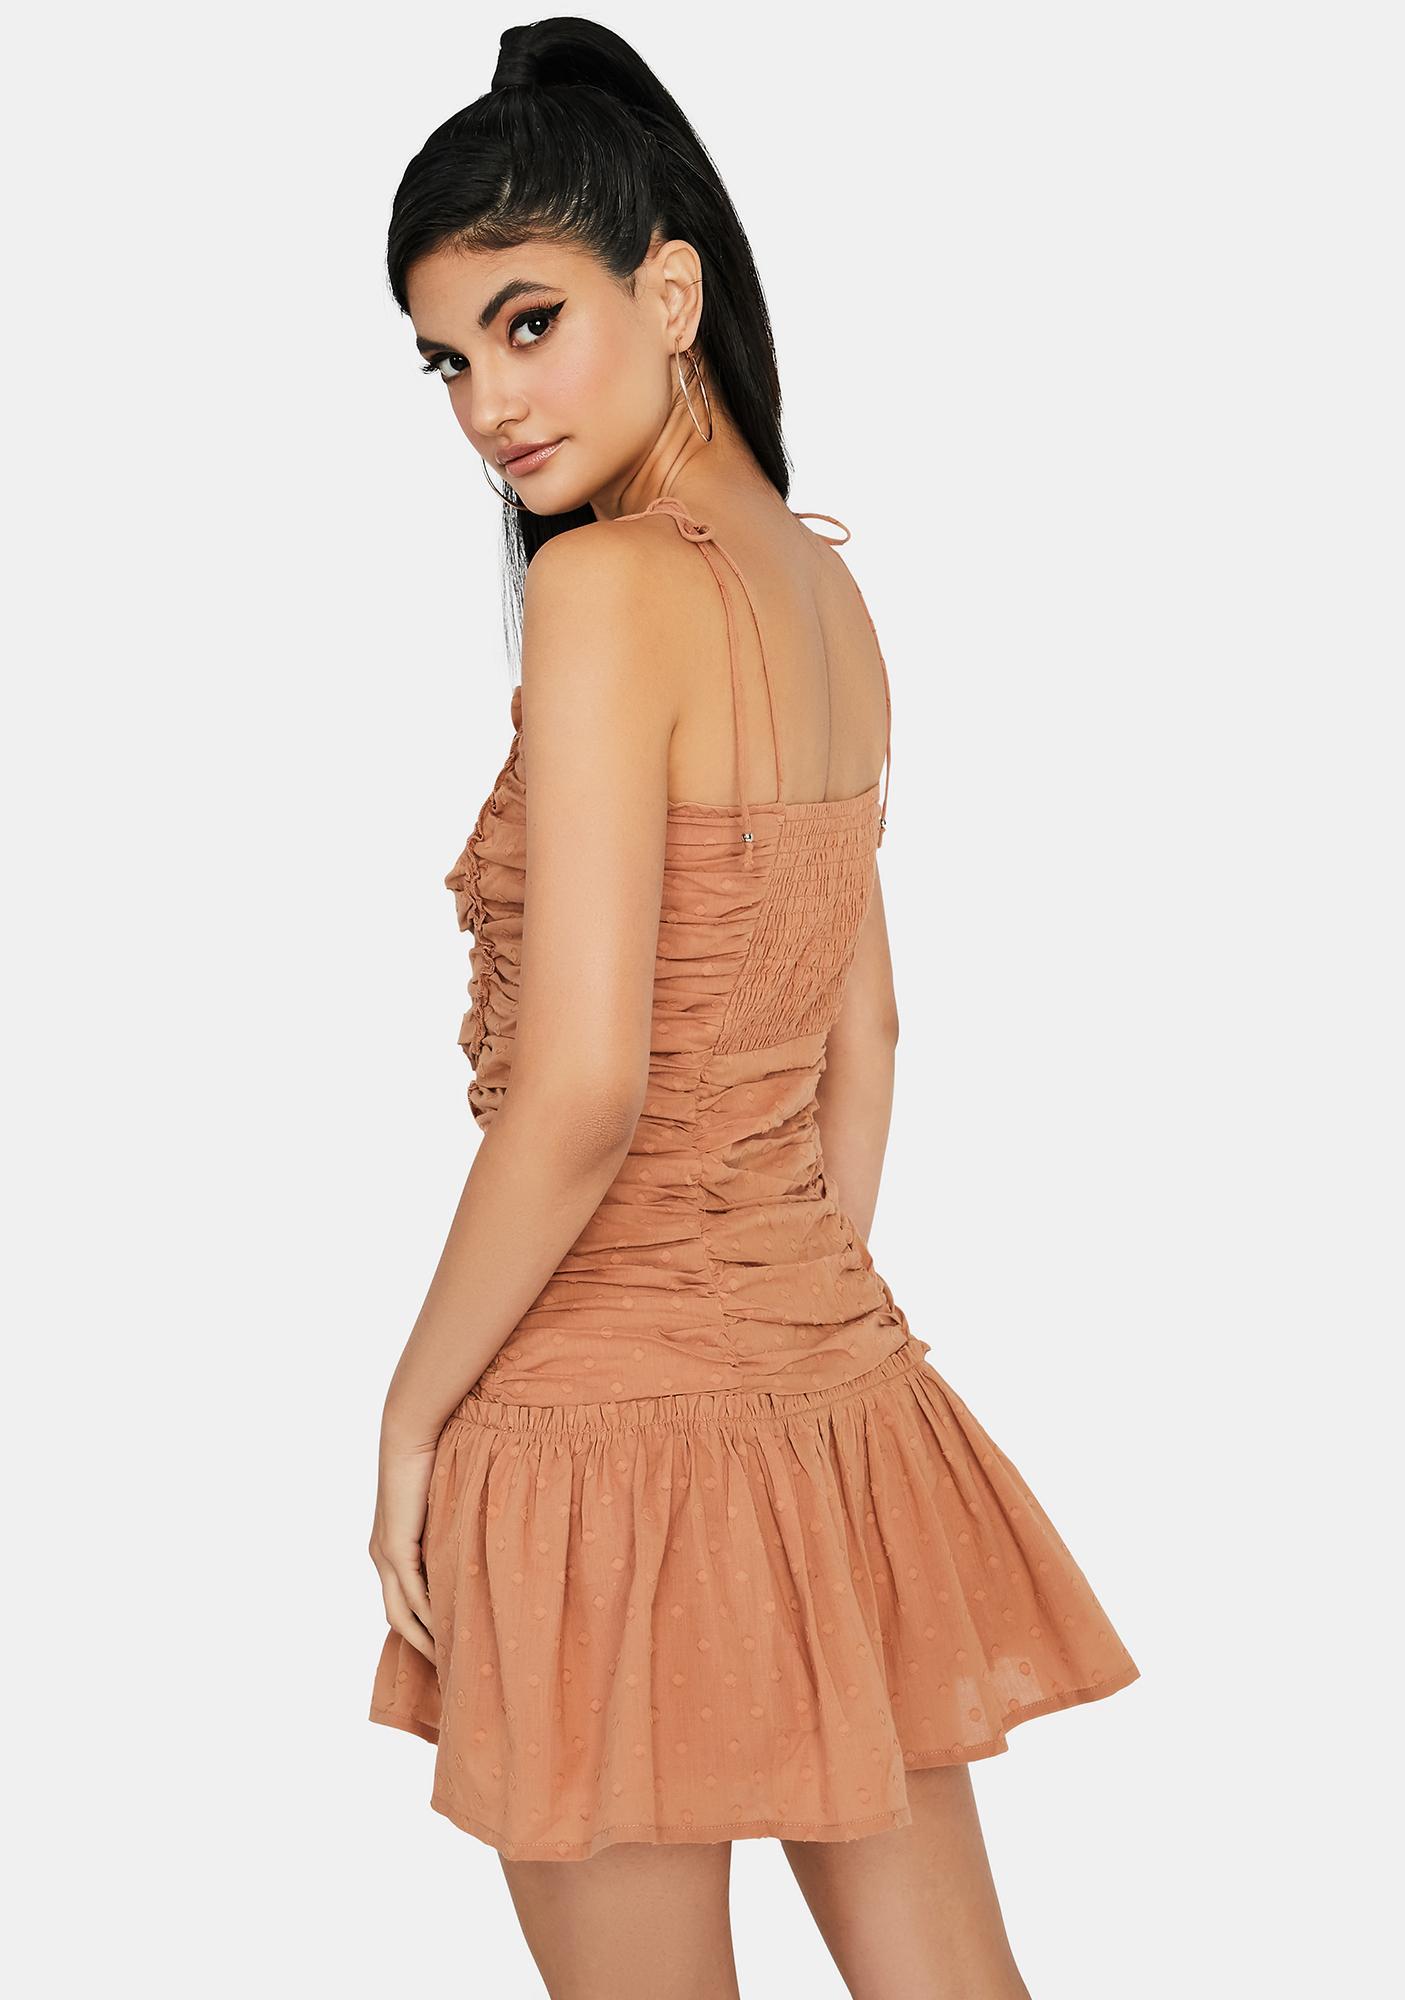 Elegant Tea Party Ruched Dress